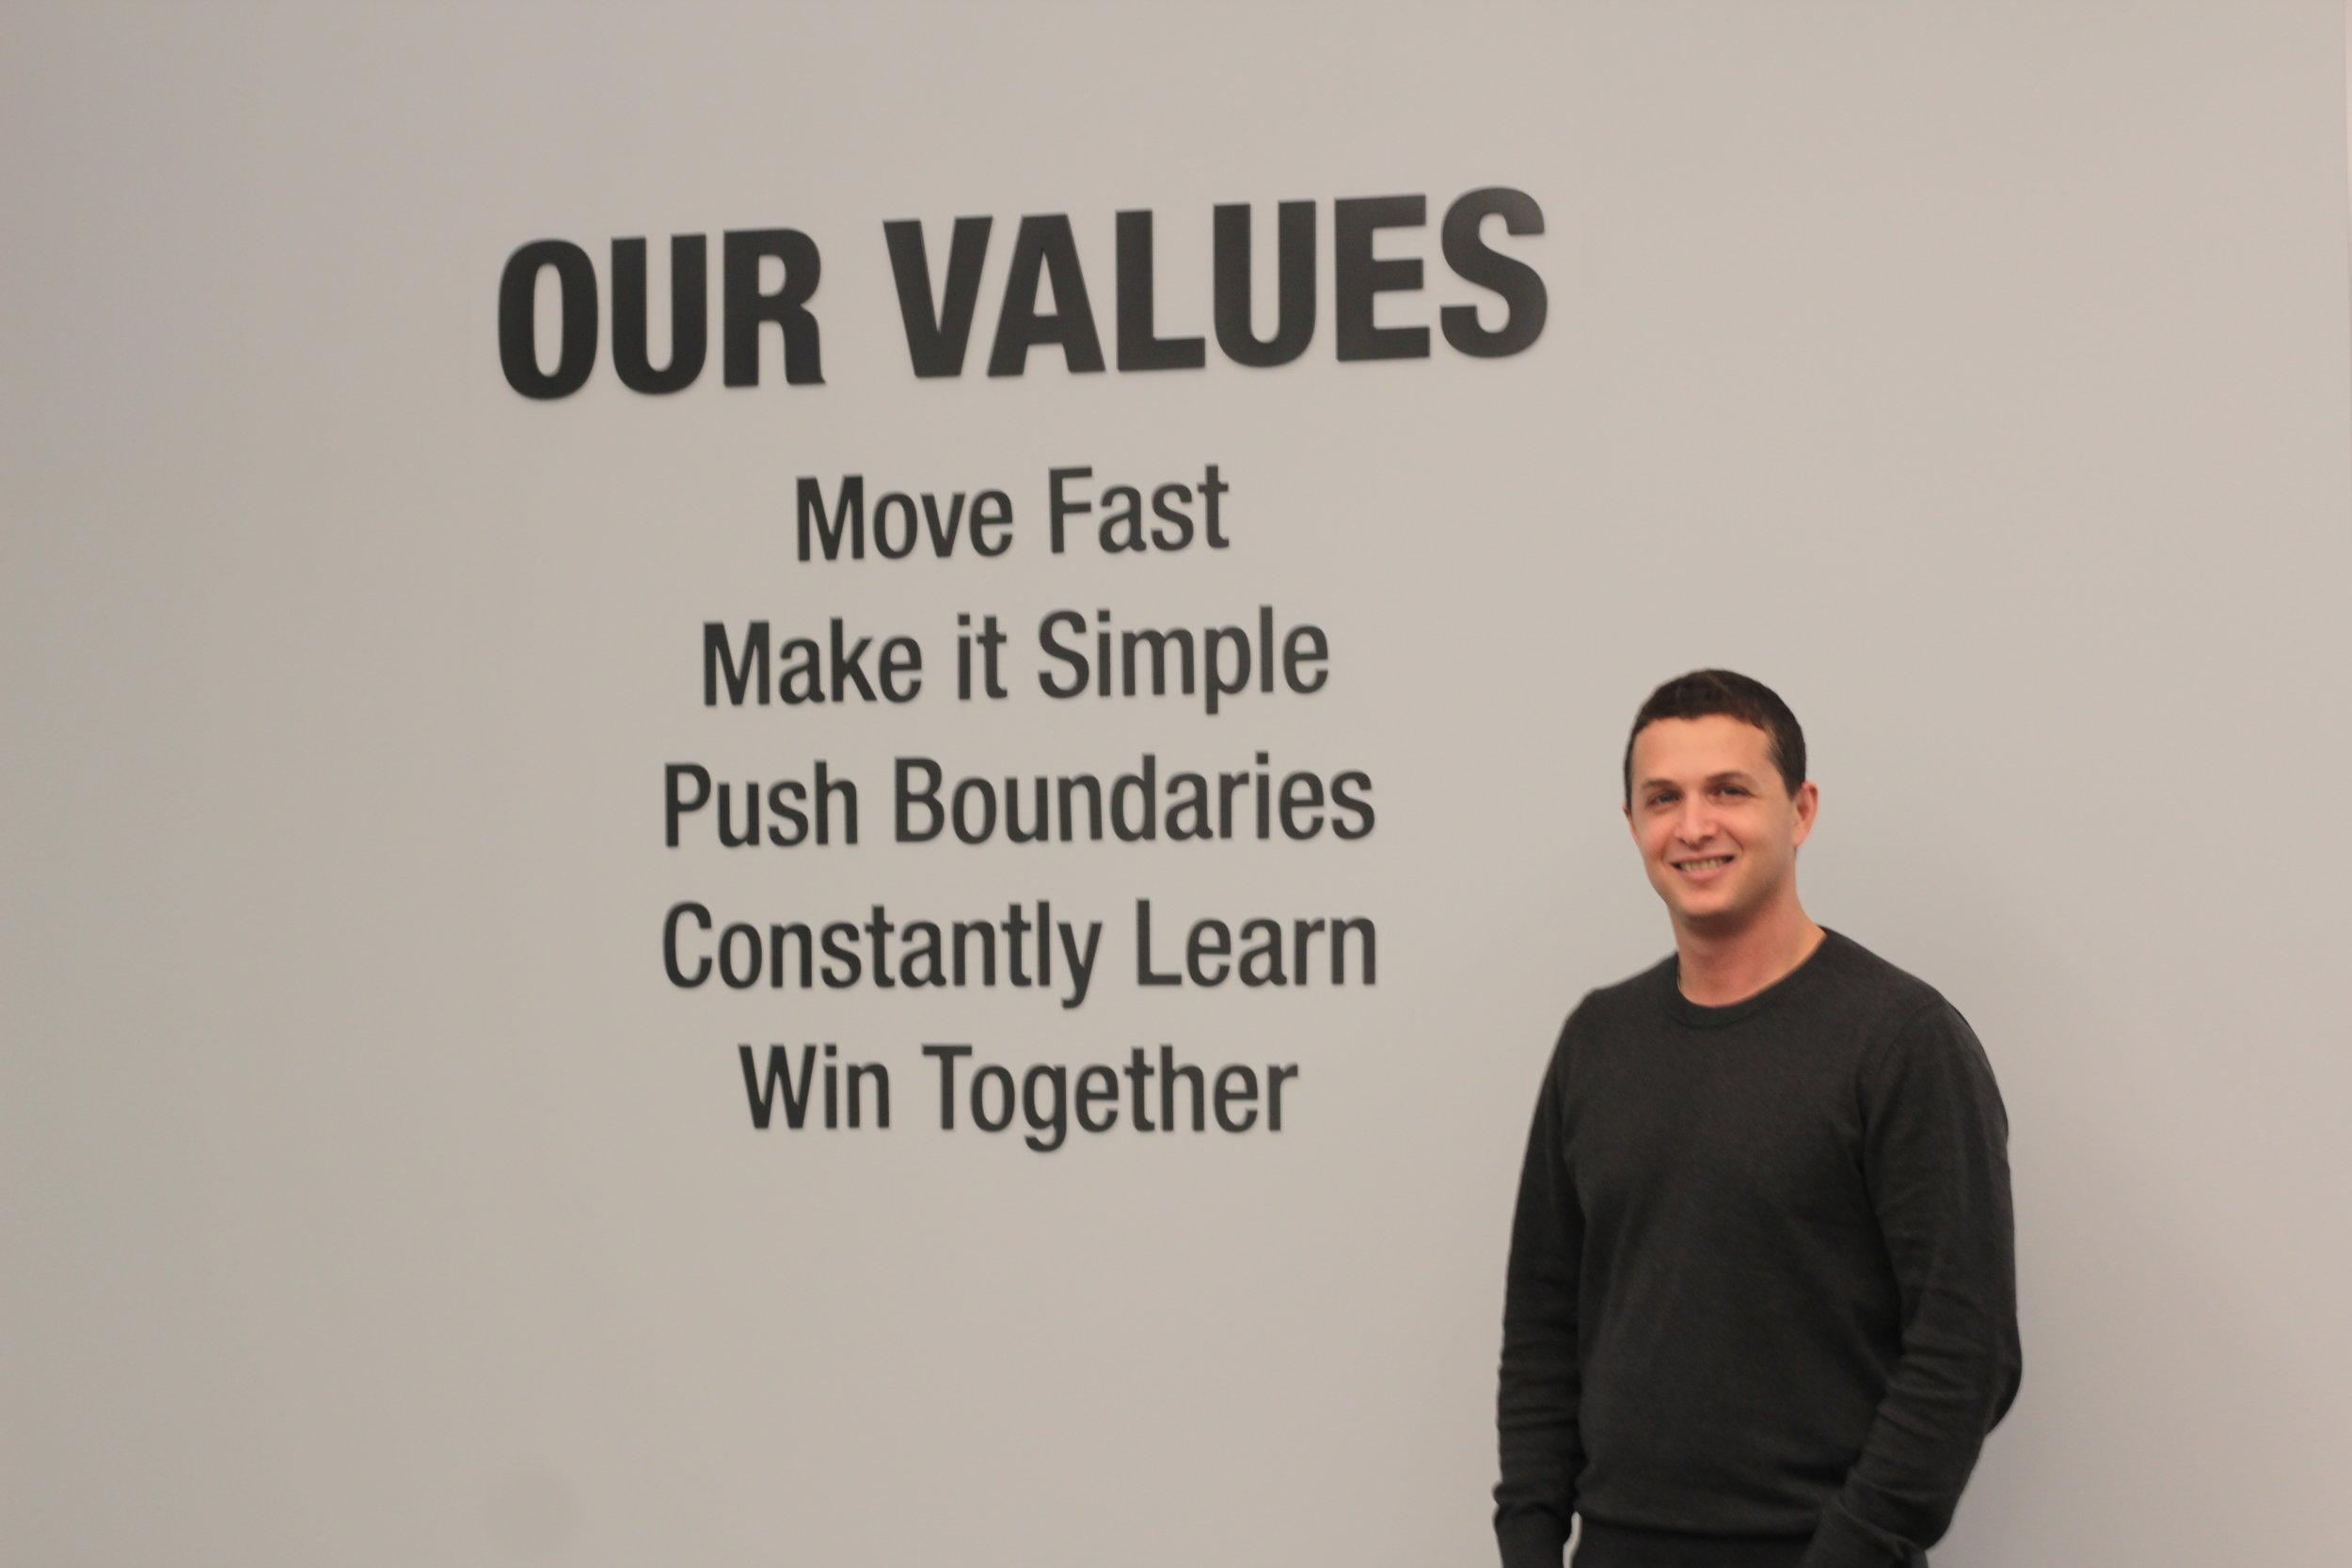 Eyal next to BlueVine's Company Values